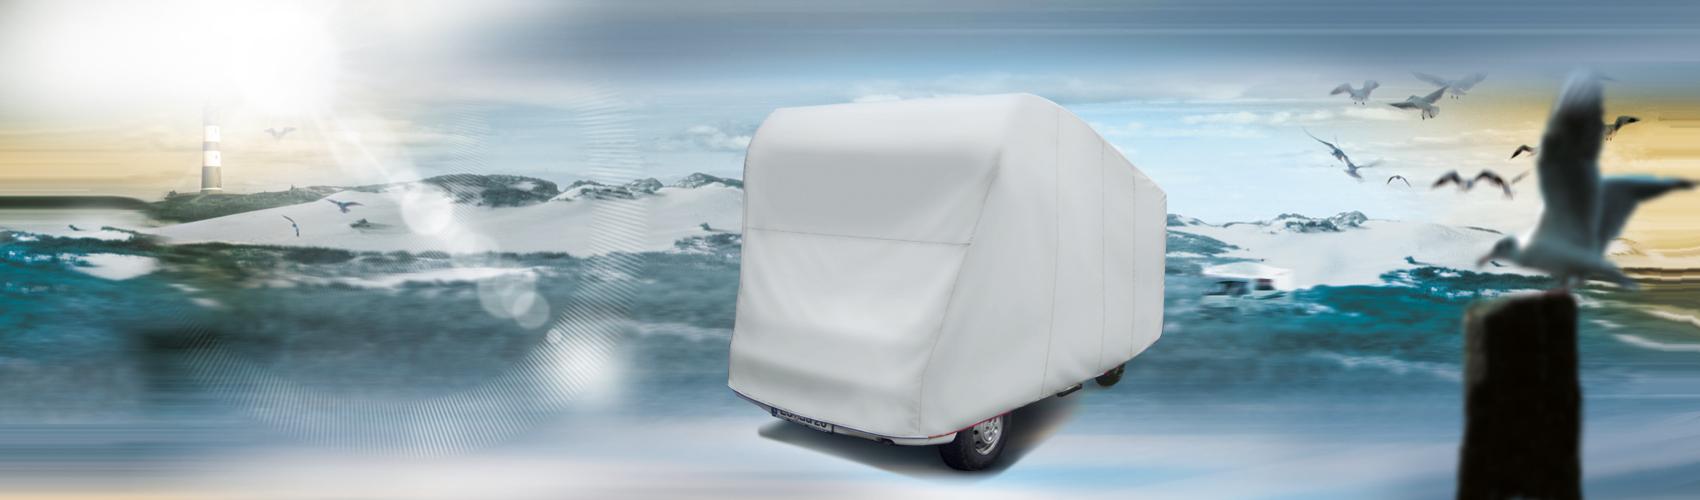 Jaxida Cover - Camp - Wohnwagen